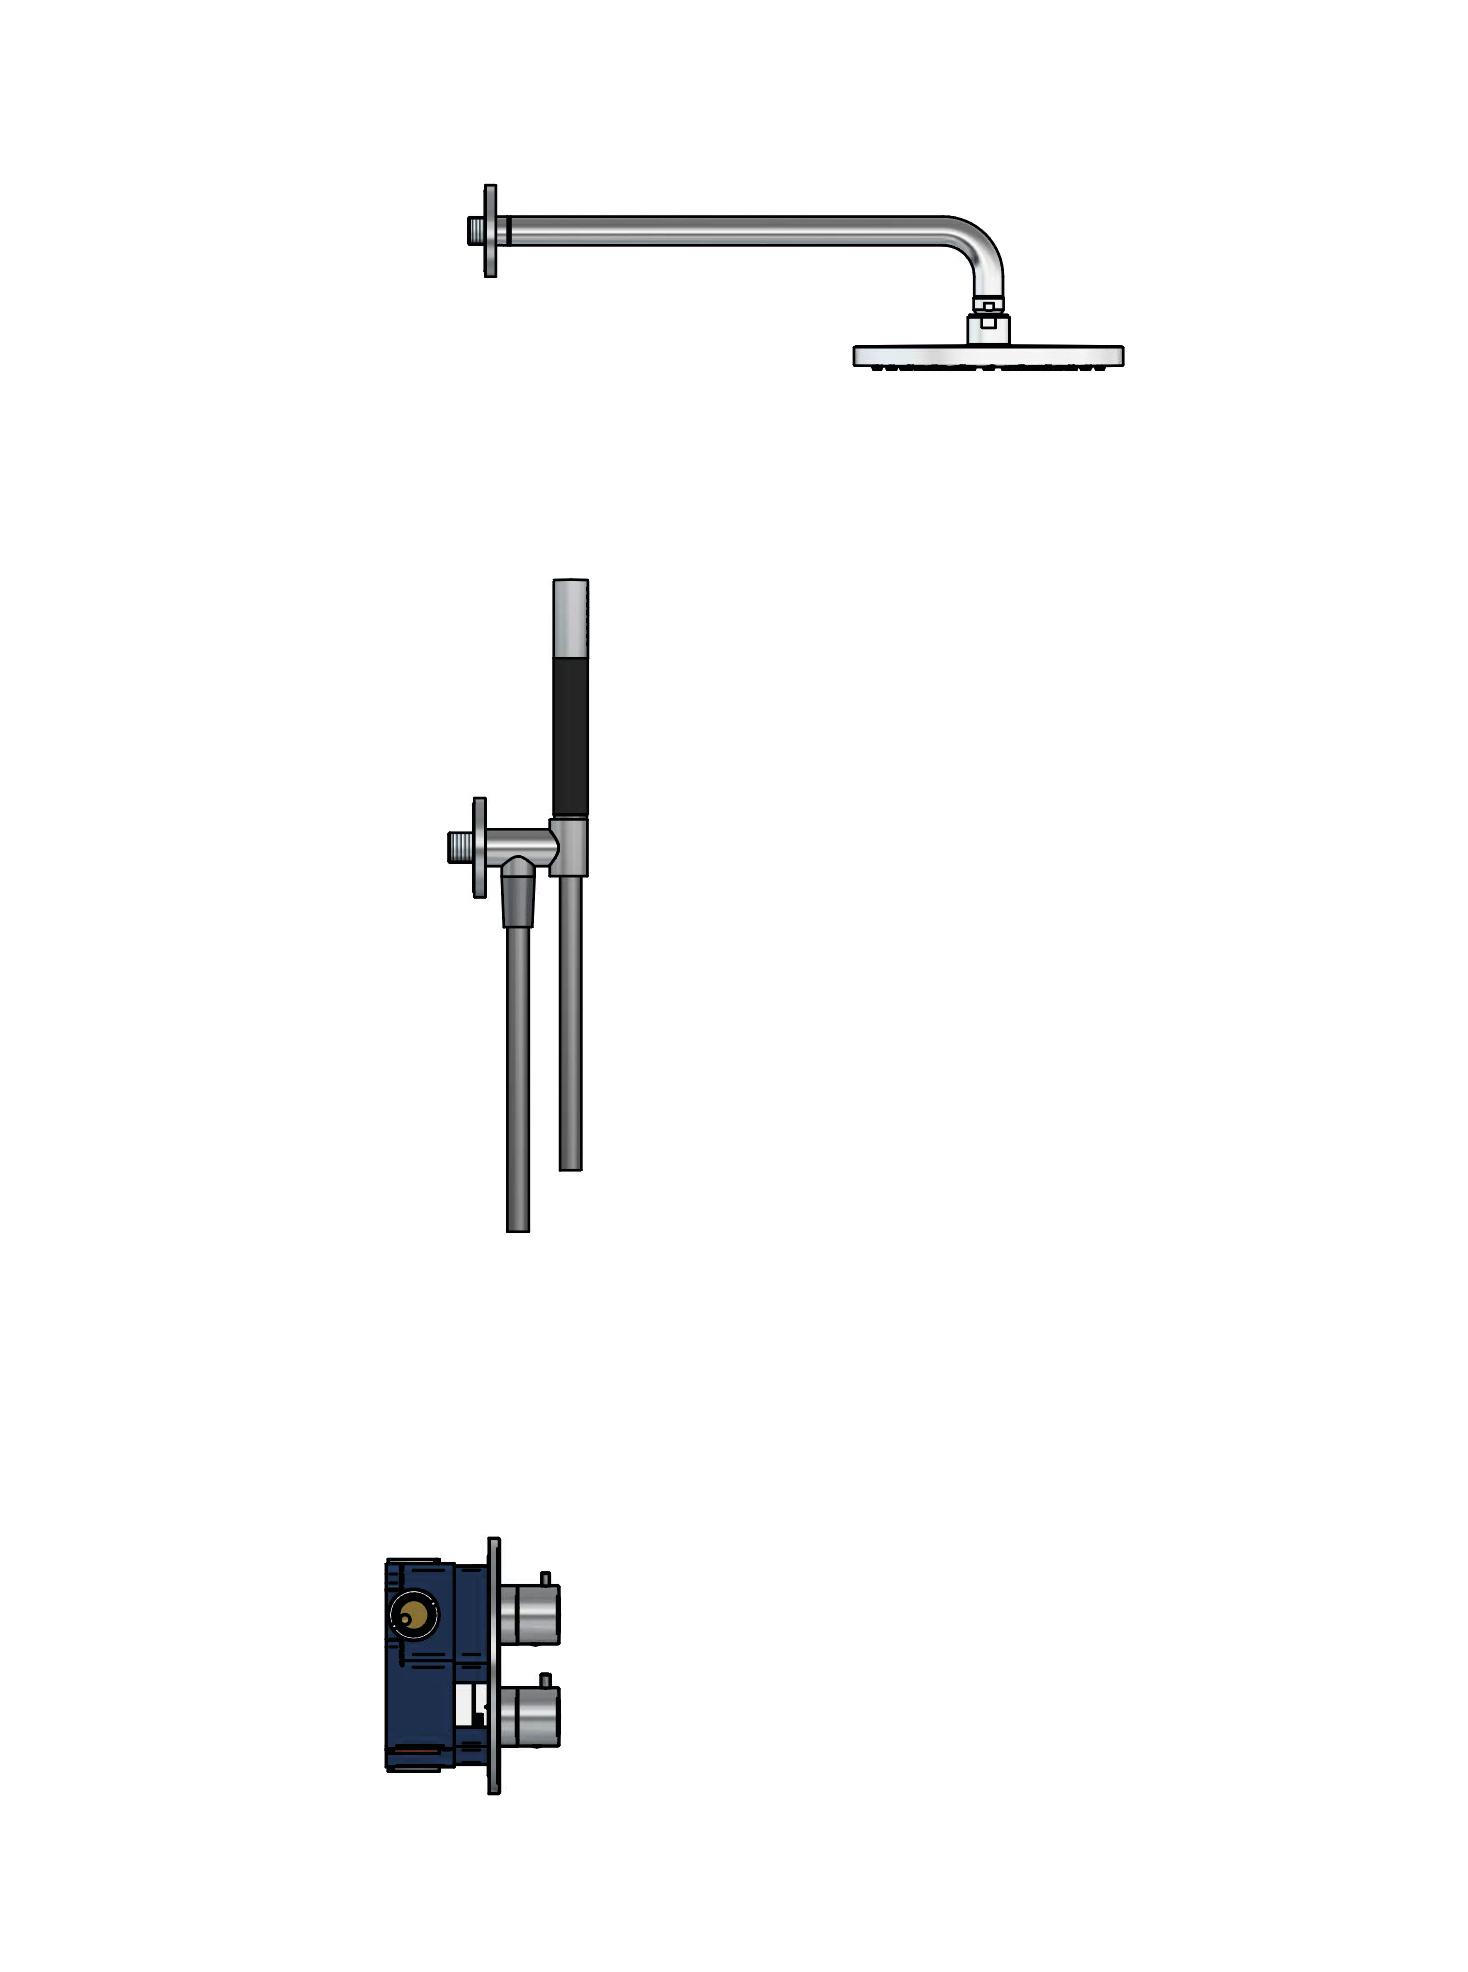 Hotbath Cobber Complete Thermostatische Douche Inbouwset Chroom IBS20A